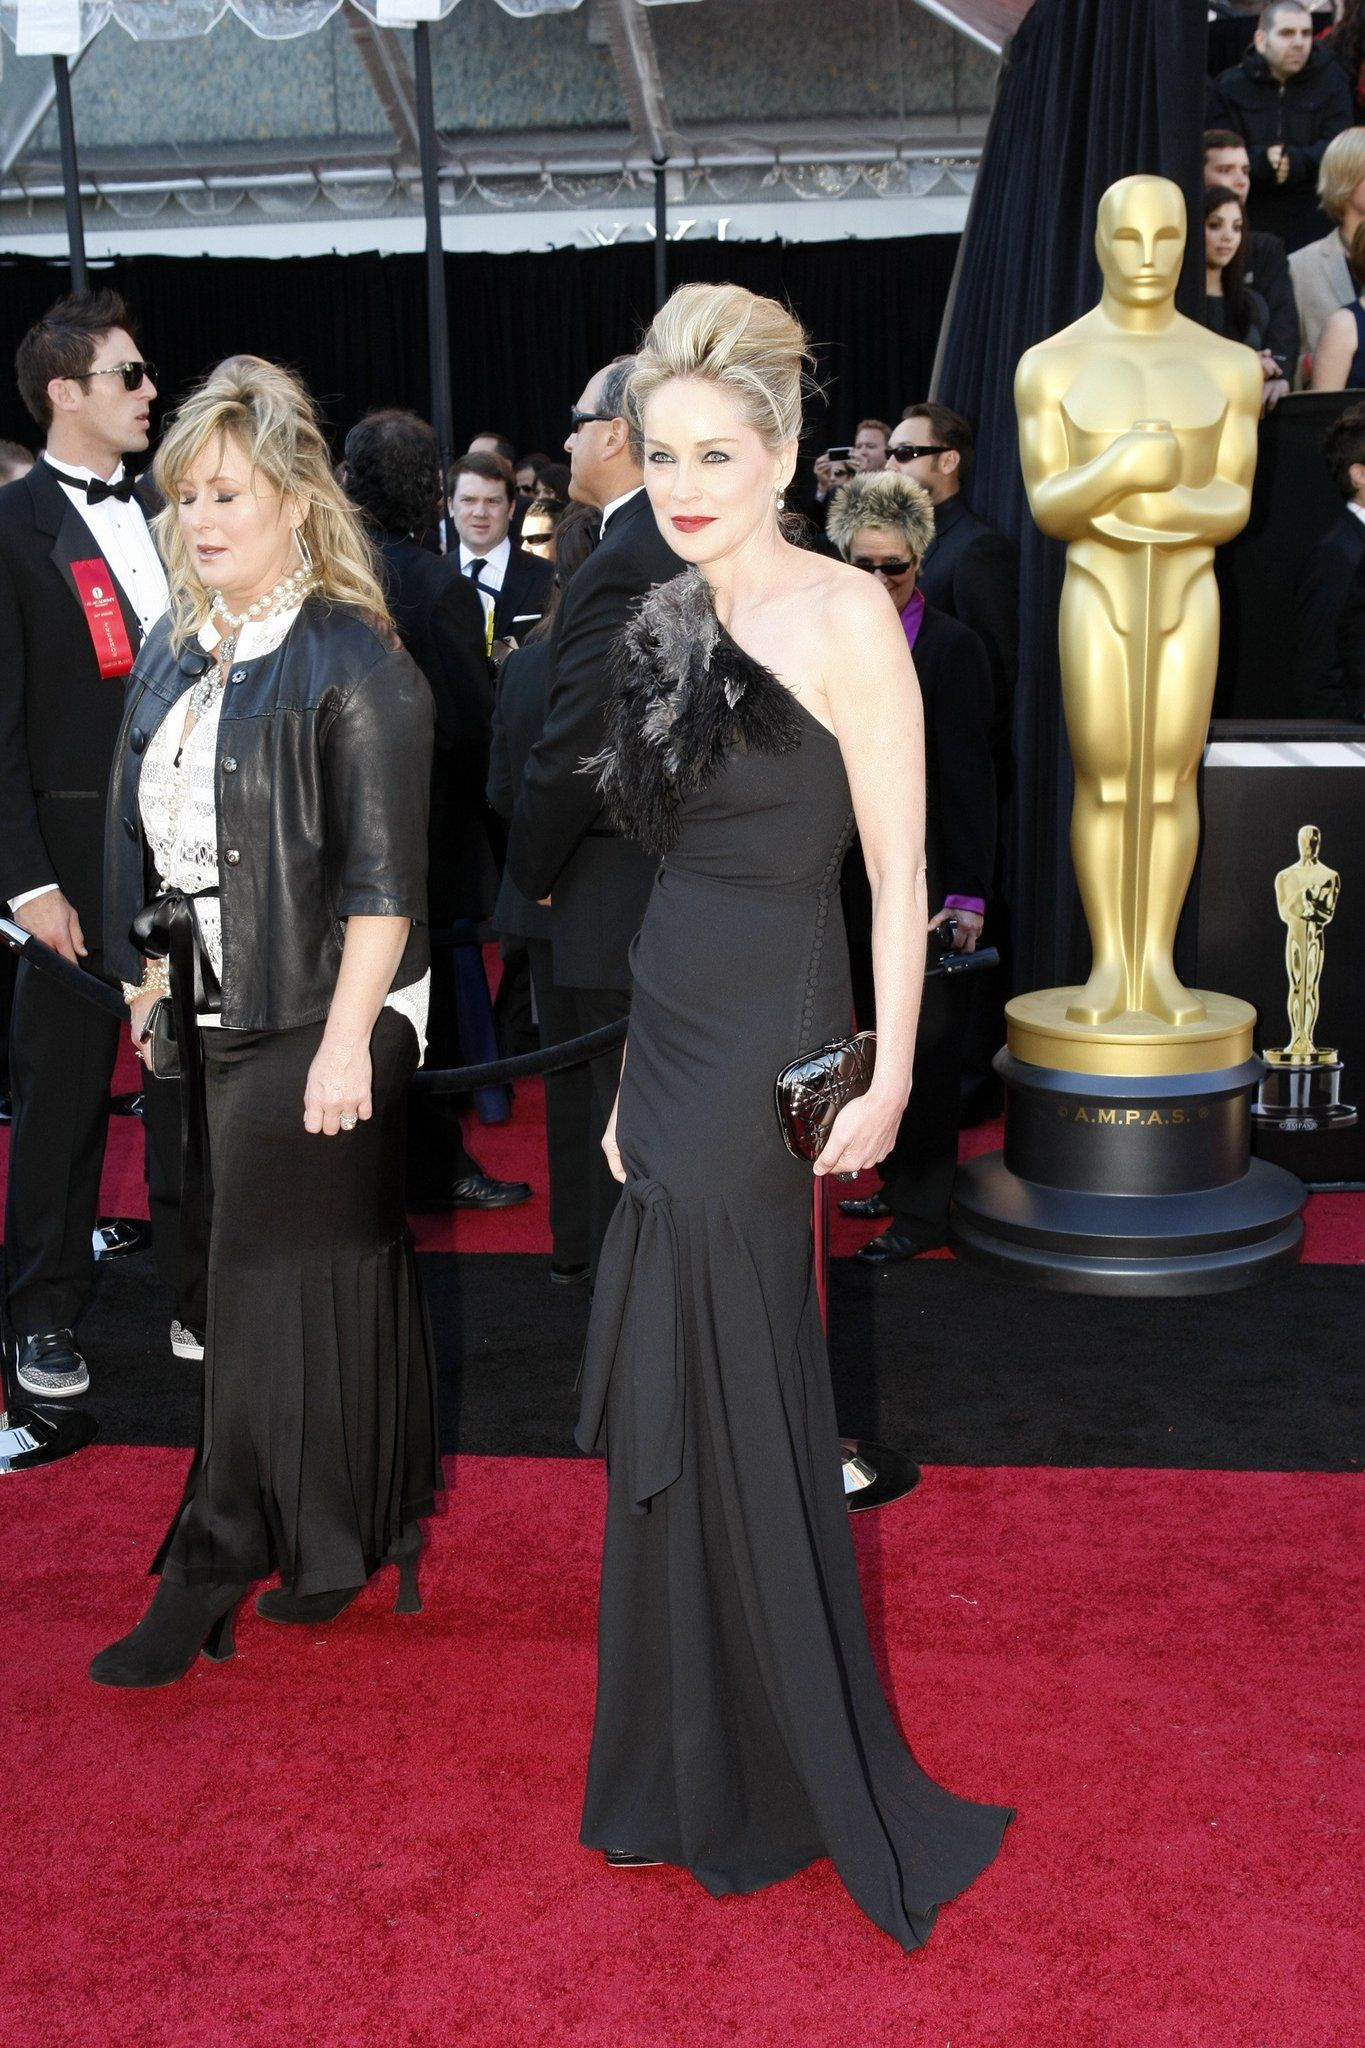 cc293a9b909d 83rd Academy Awards - 2011  Sexiest Dresses 2011 in 2019 ...